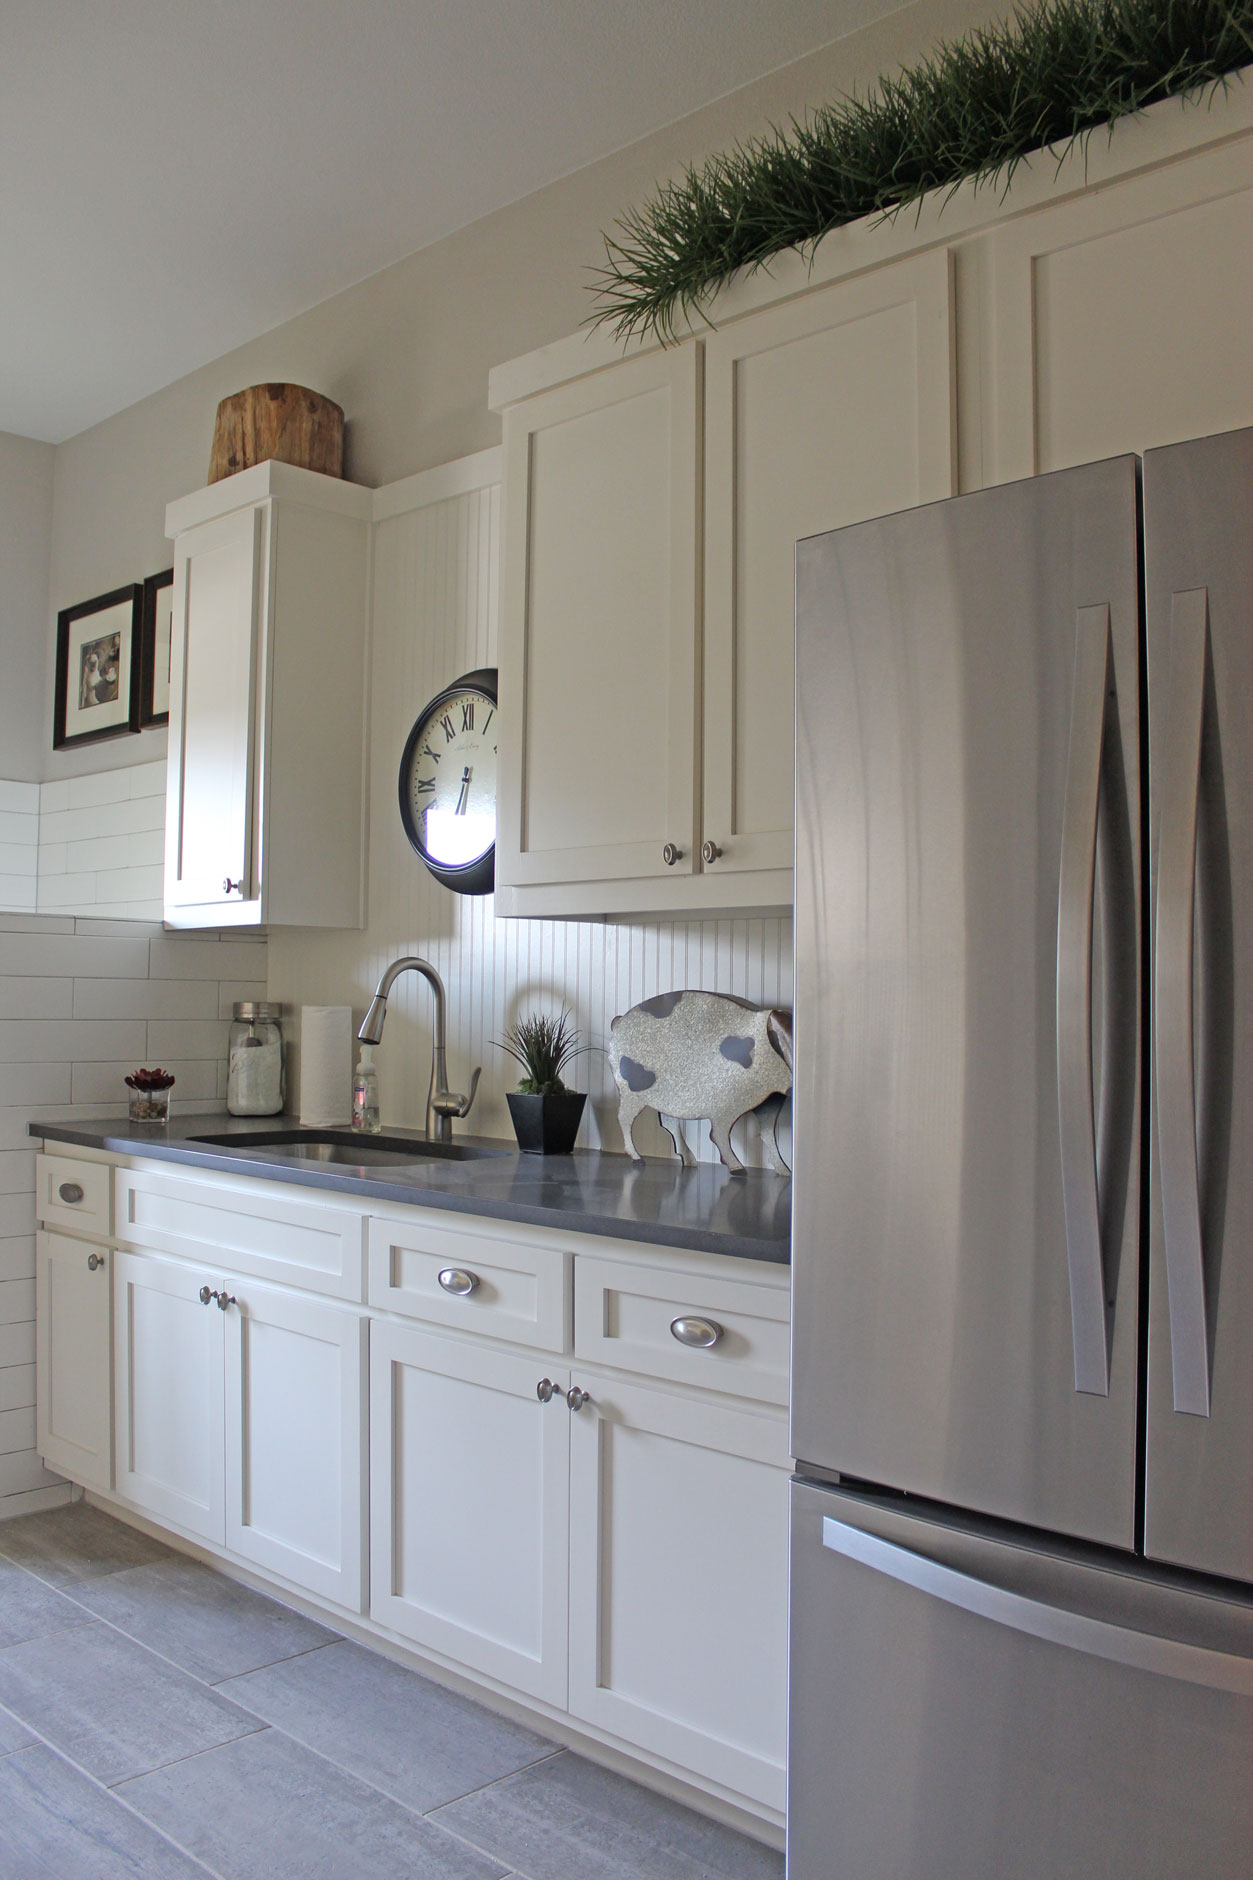 Burrows Cabinets laundry room with white beadboard backsplash